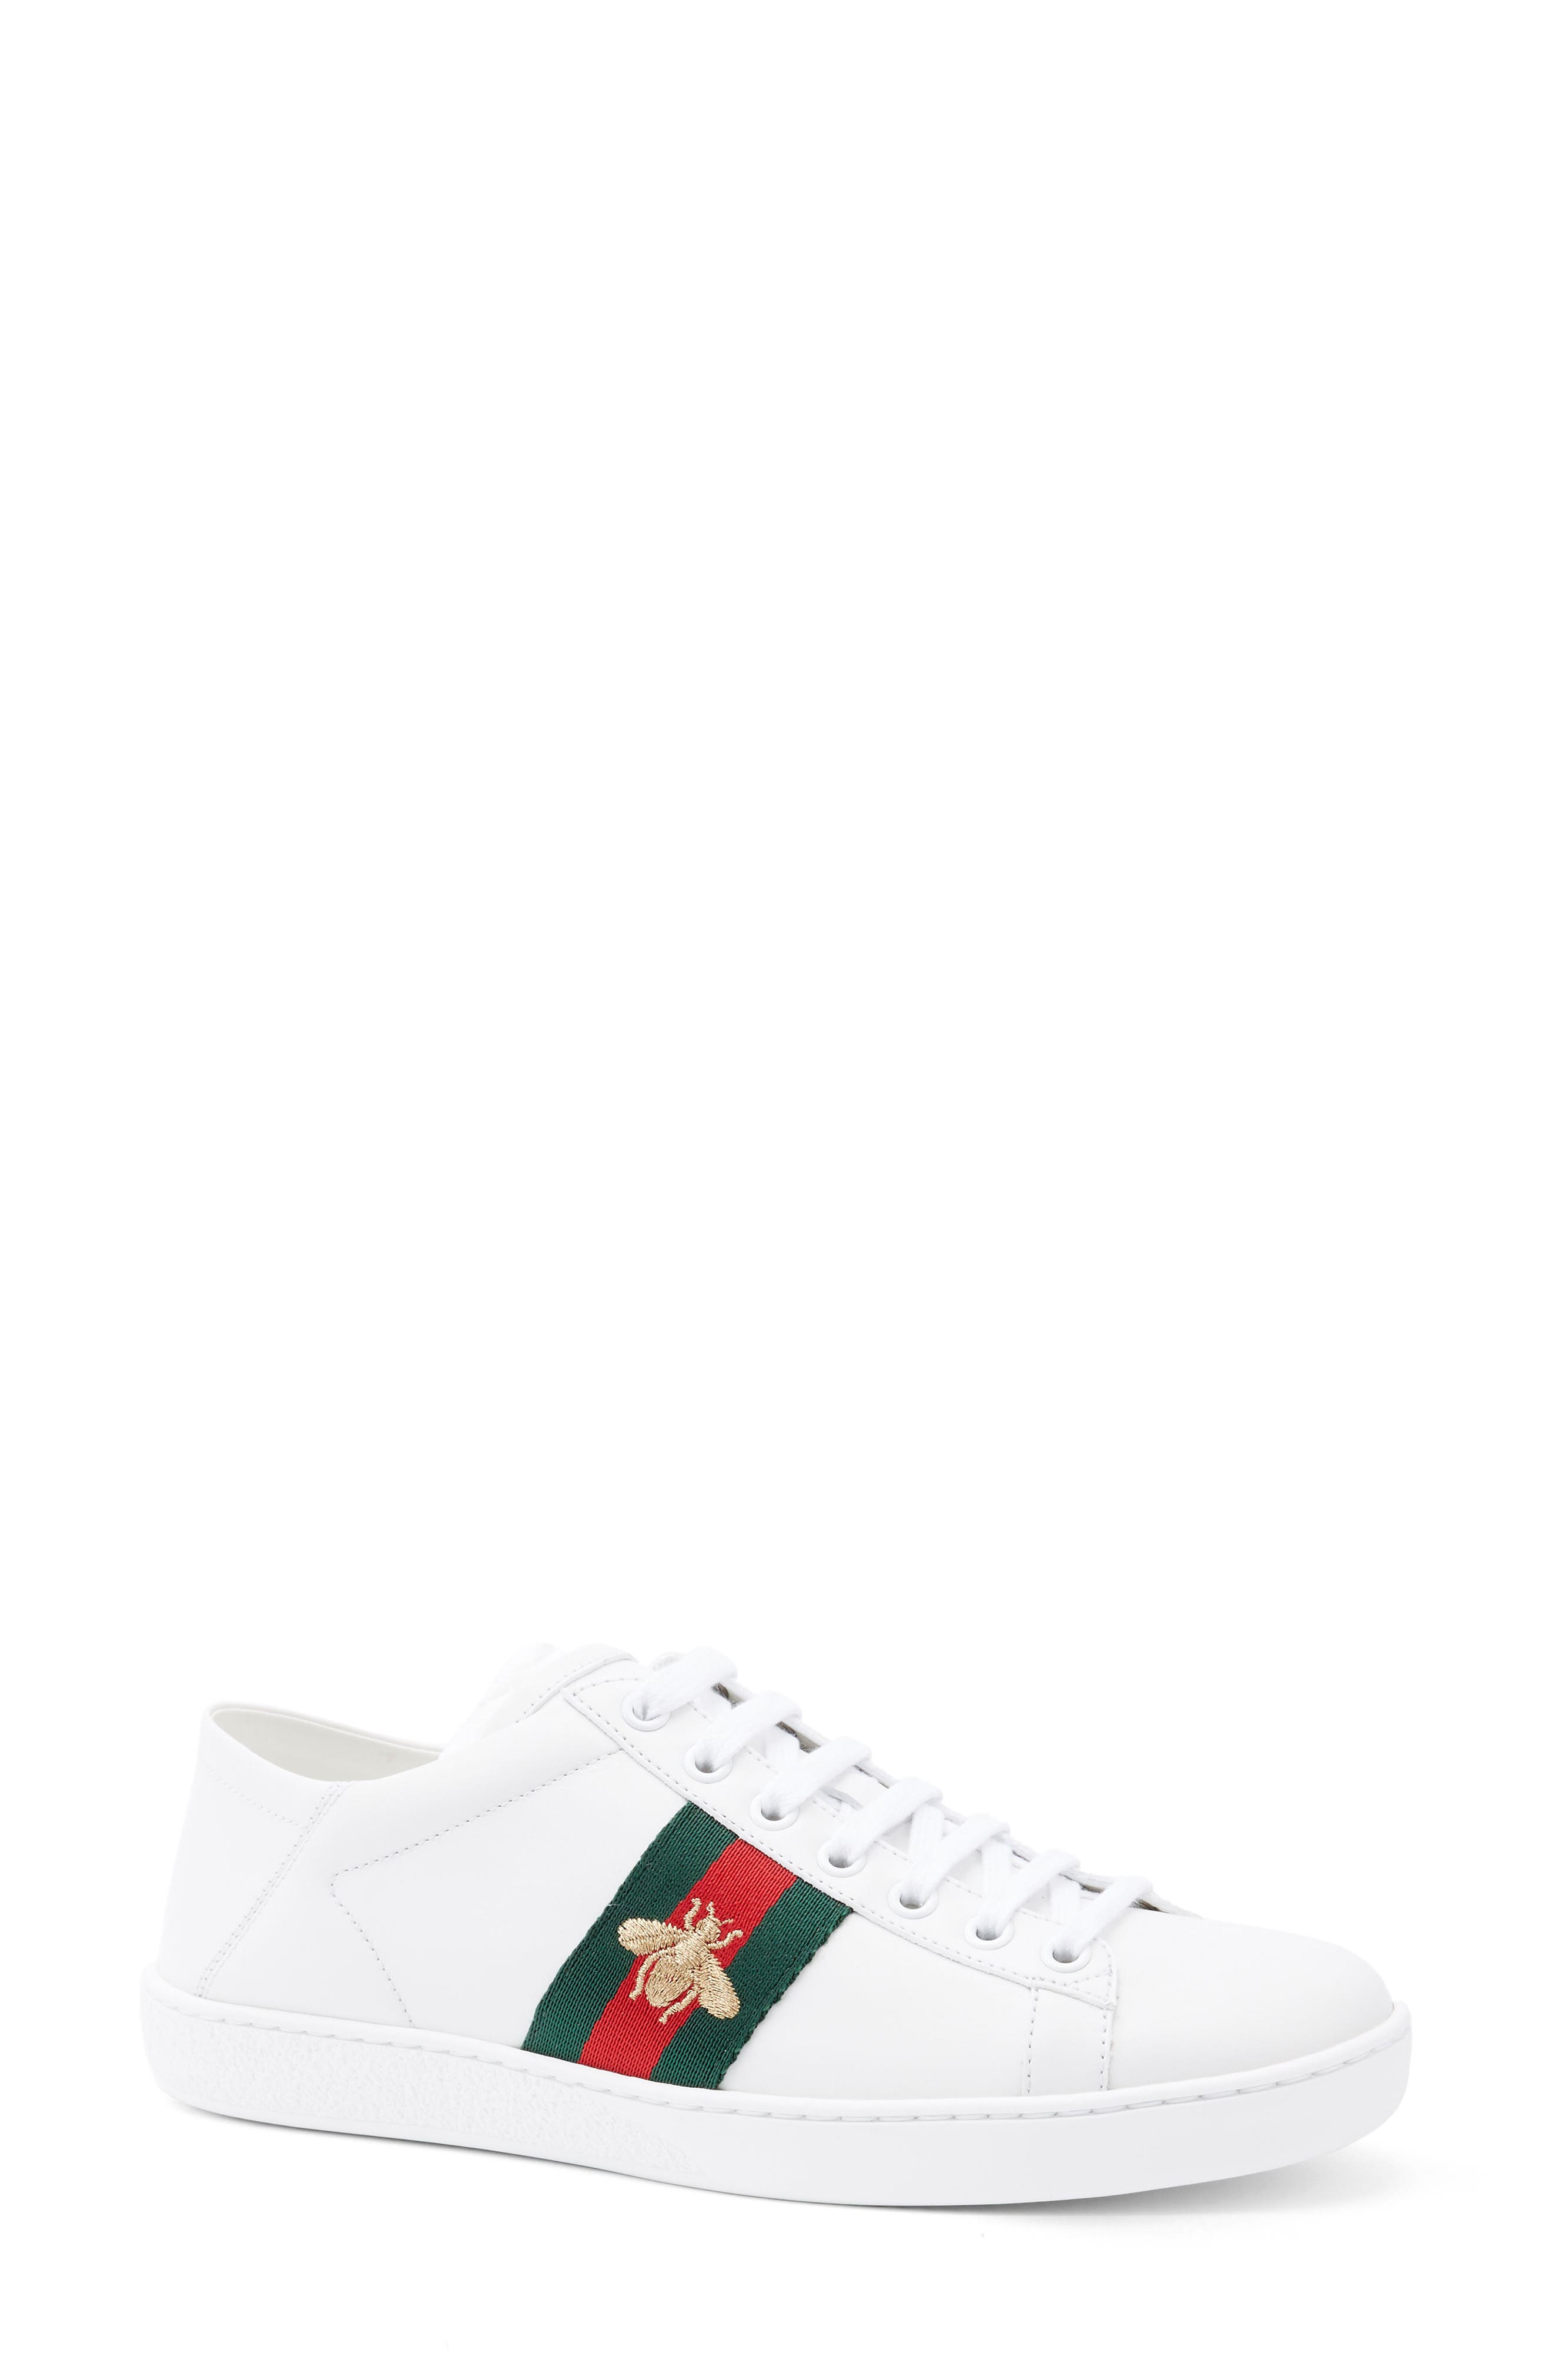 Alternate Image 1 Selected - Gucci New Ace Convertible Heel Sneaker (Women)